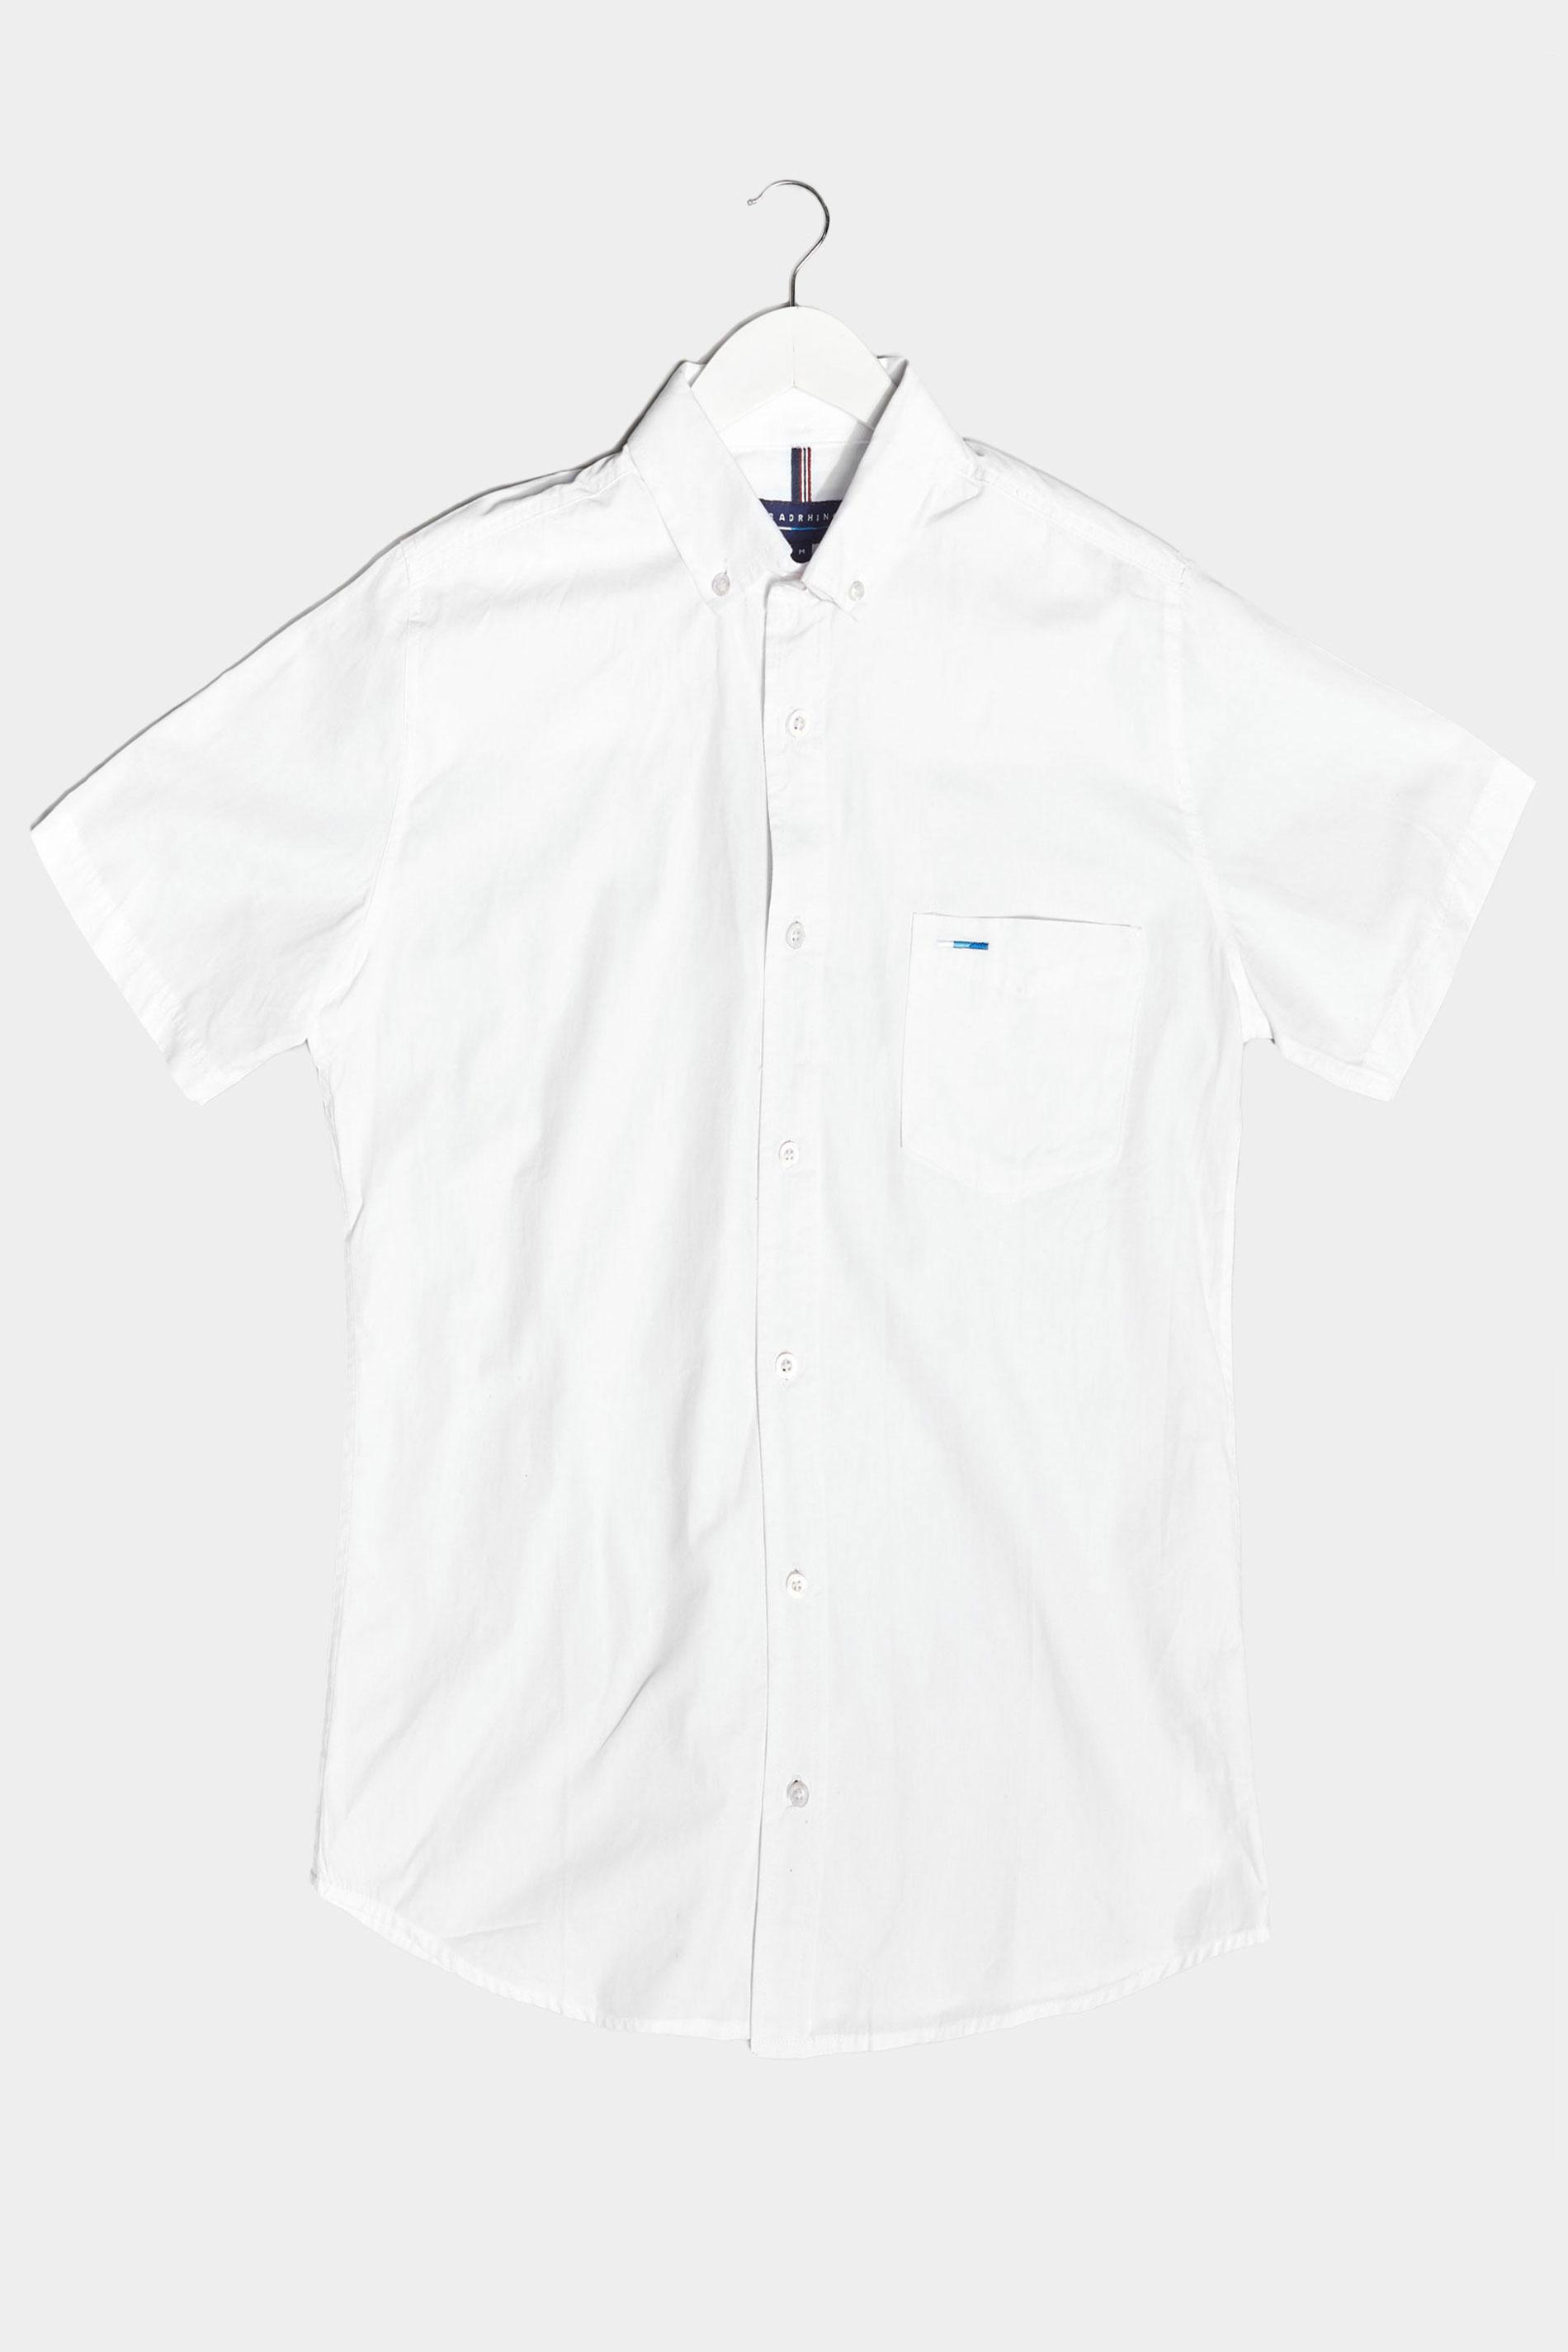 BadRhino White Cotton Poplin Short Sleeve Shirt